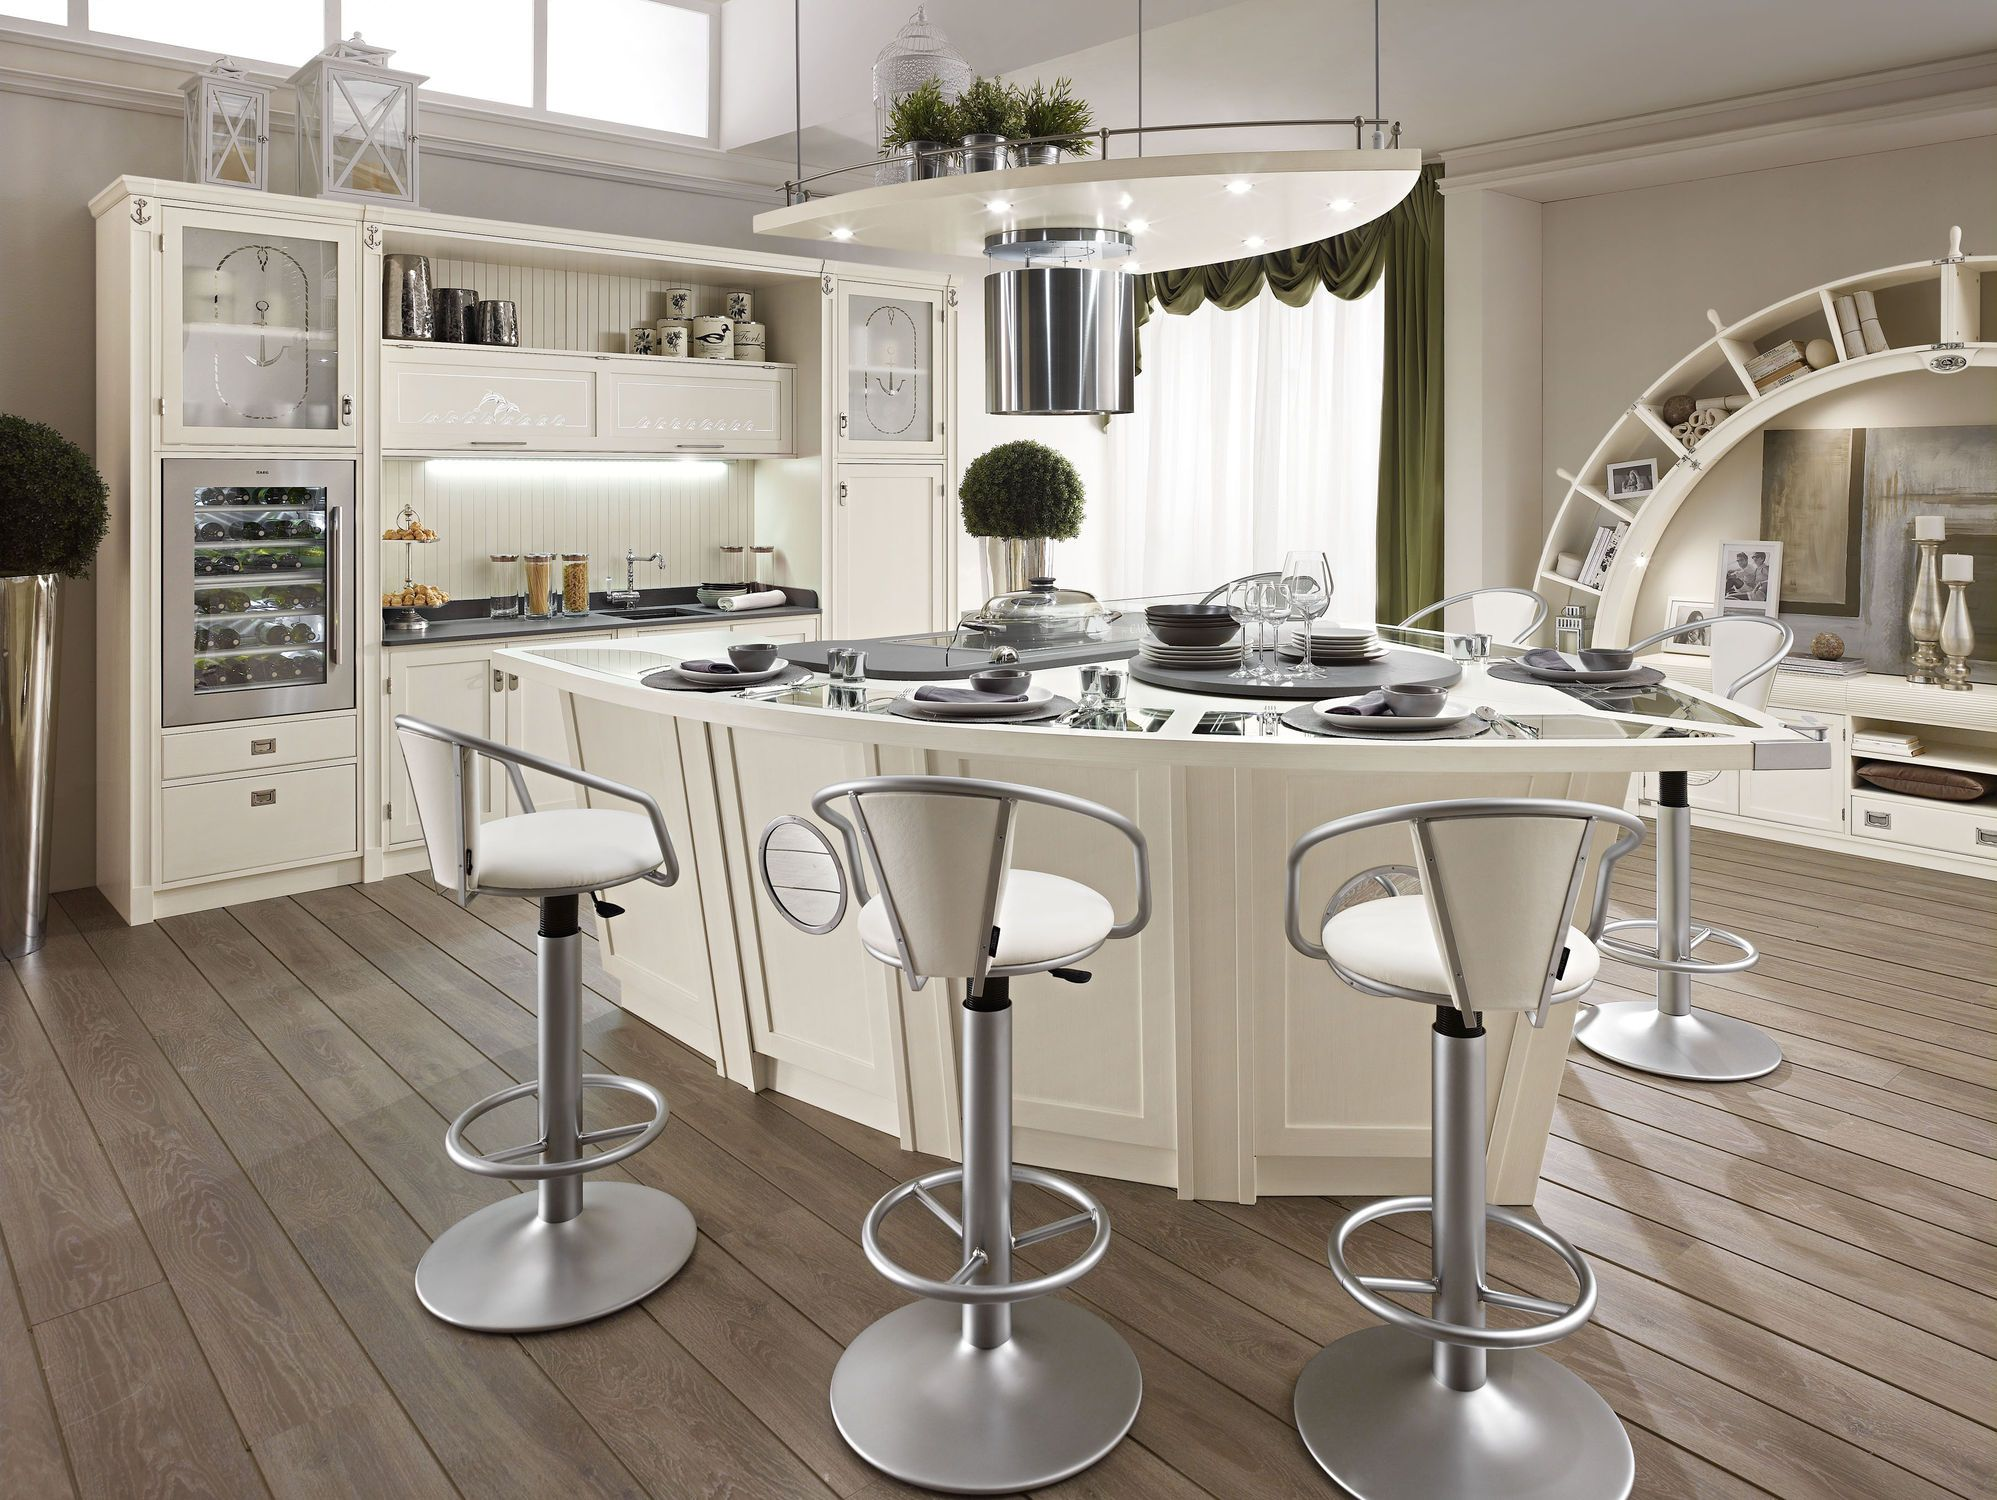 Kitchen Island Swivel Bar Stools